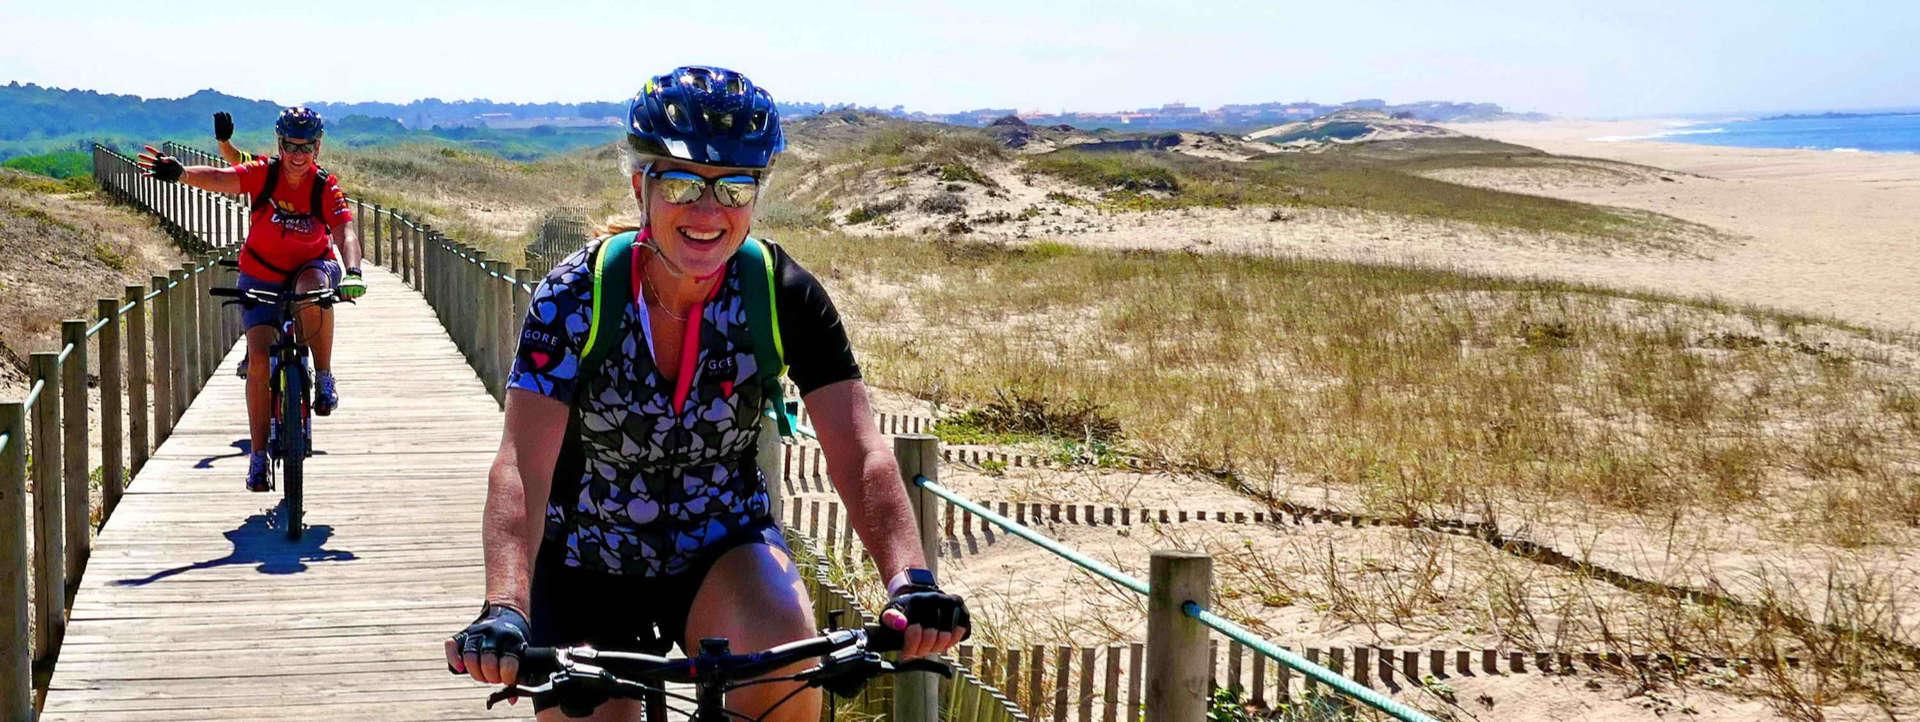 Cycling the Camino de Santiago, portuguese coastal way